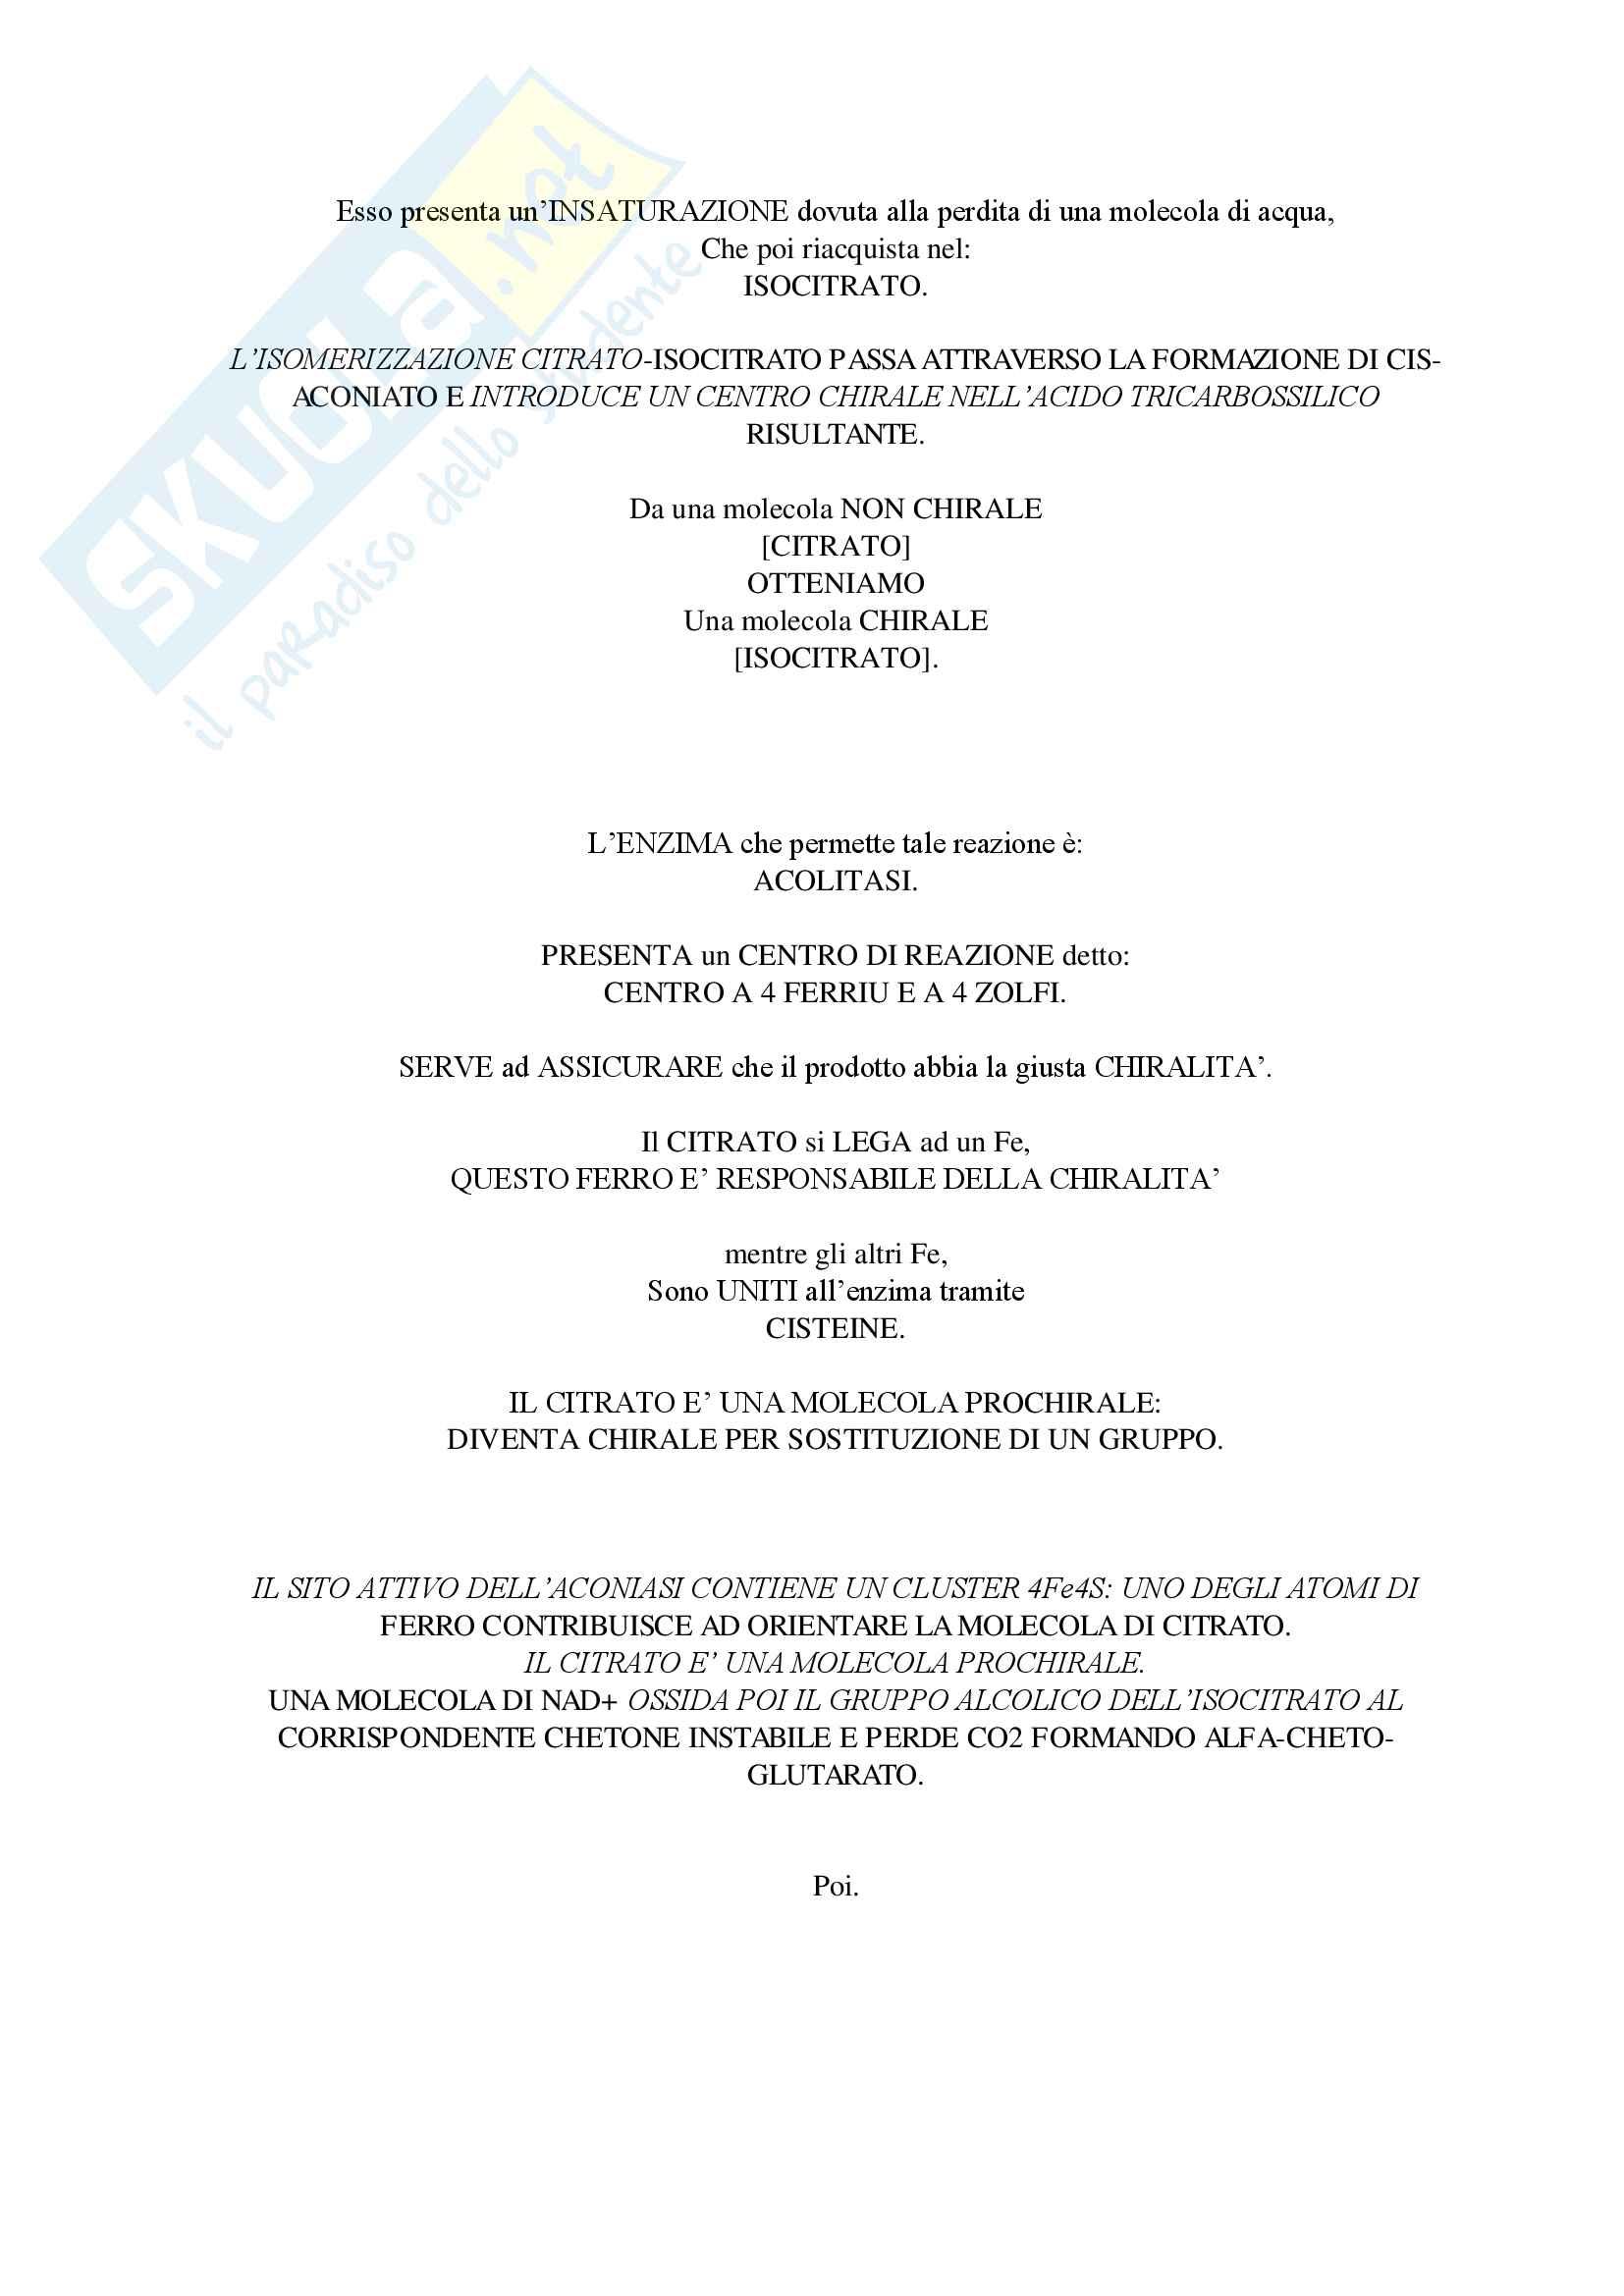 Biochimica Generale Mod.1 (Teoria Secondo Parziale) Pag. 41